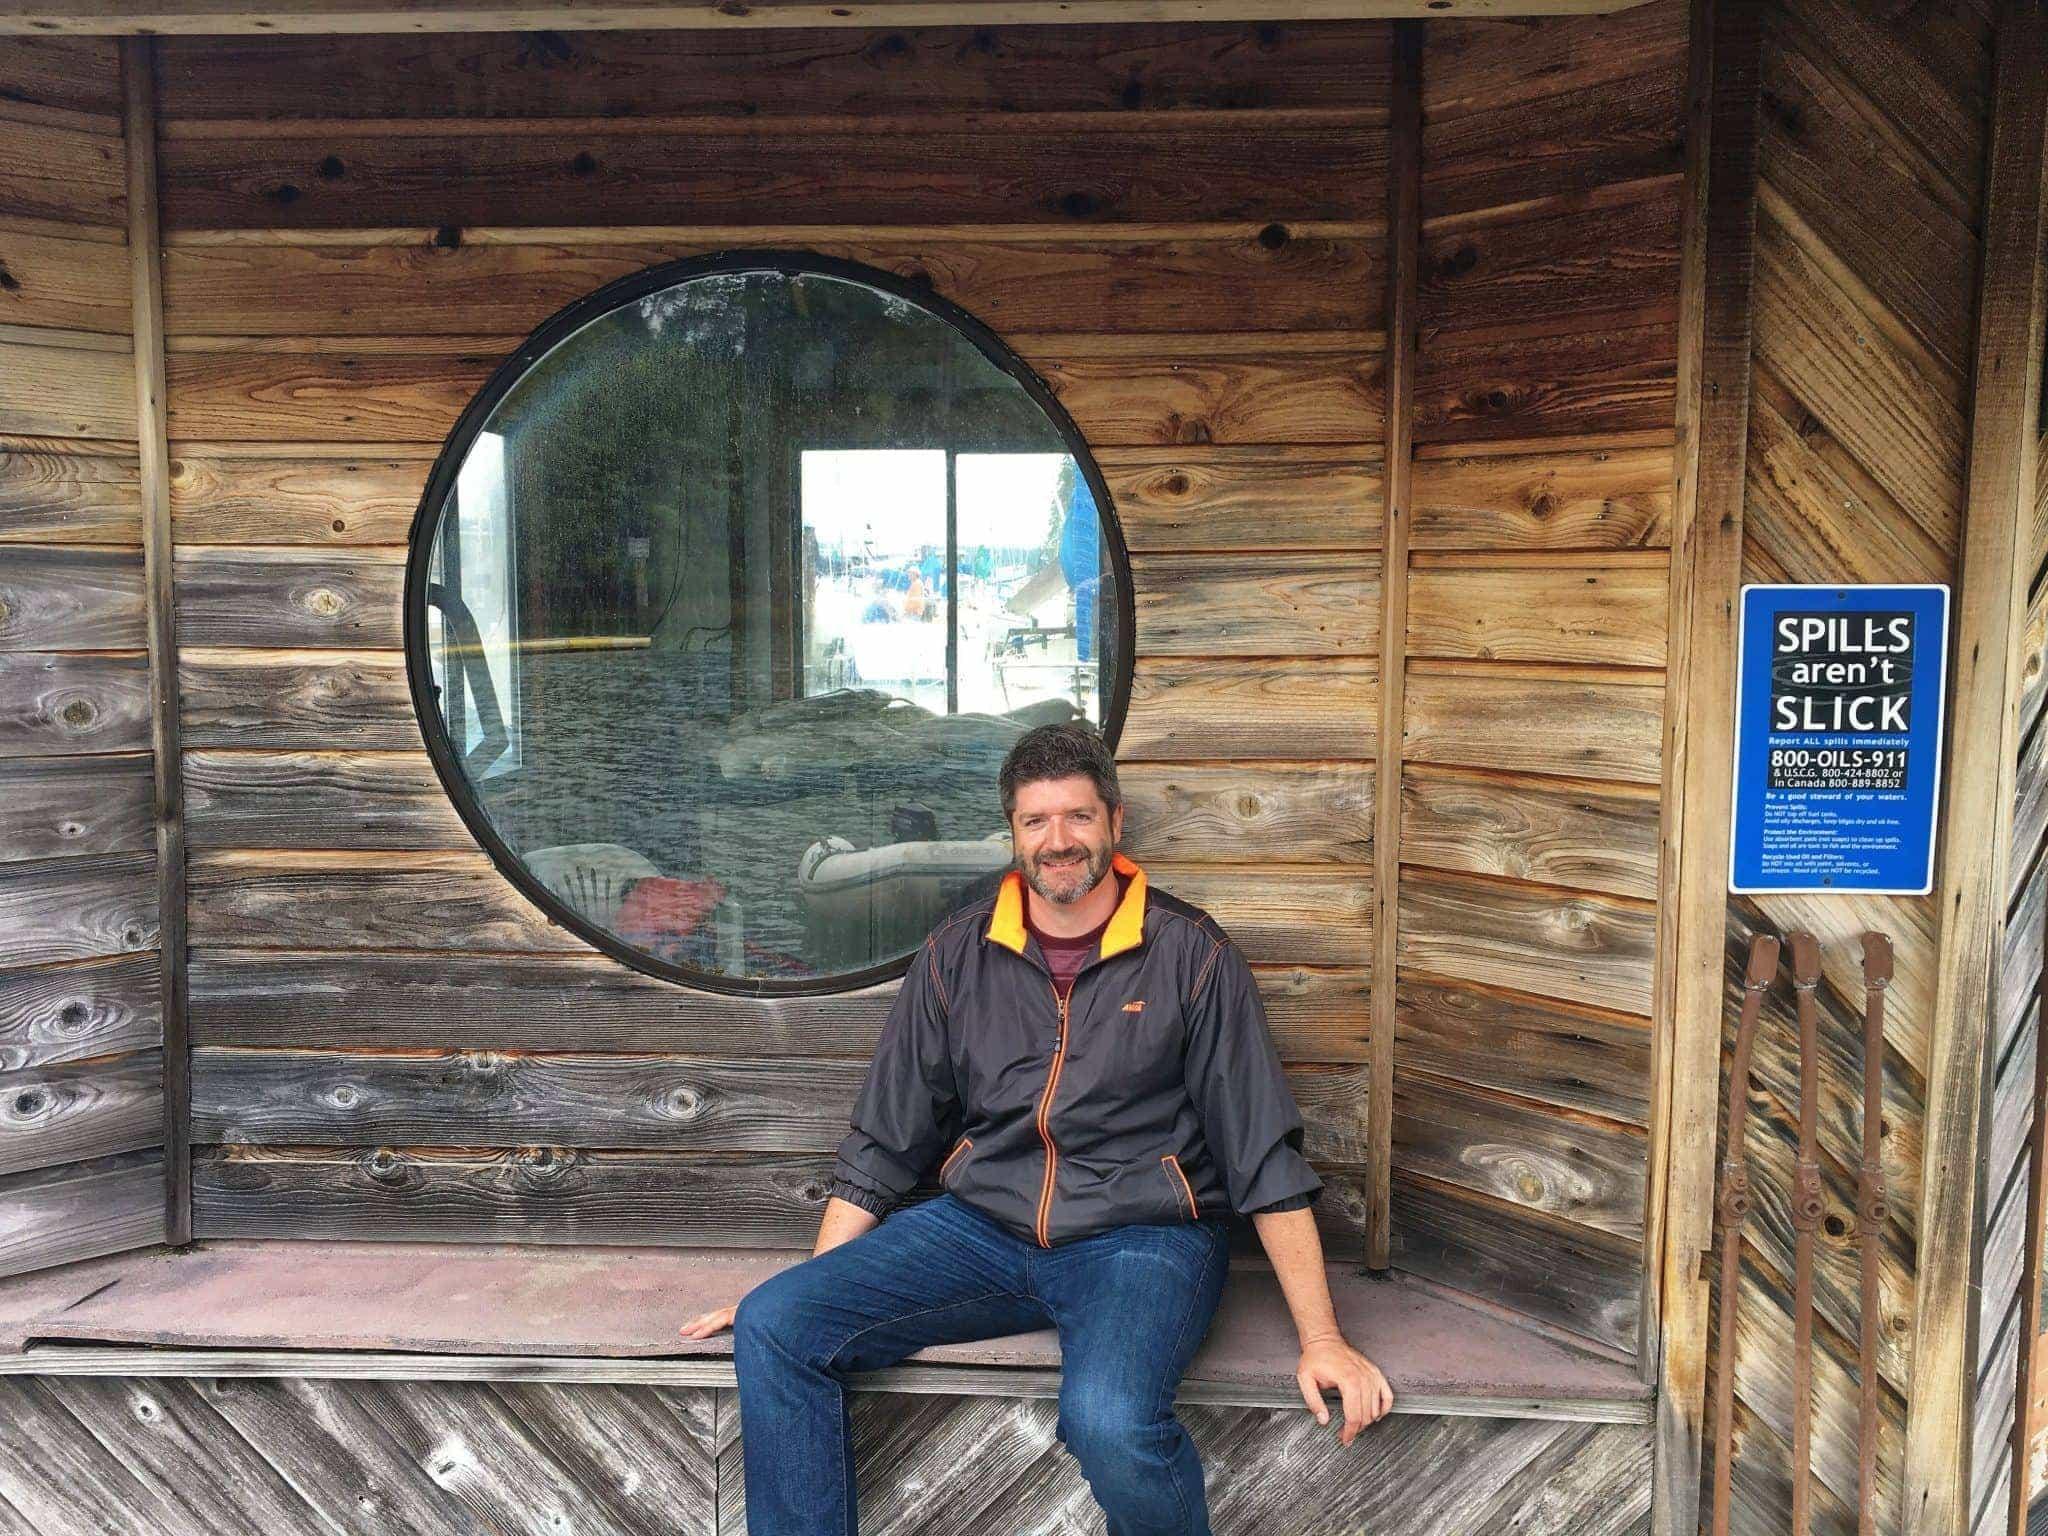 Jake at the Jarrell Cove Marina fuel dock